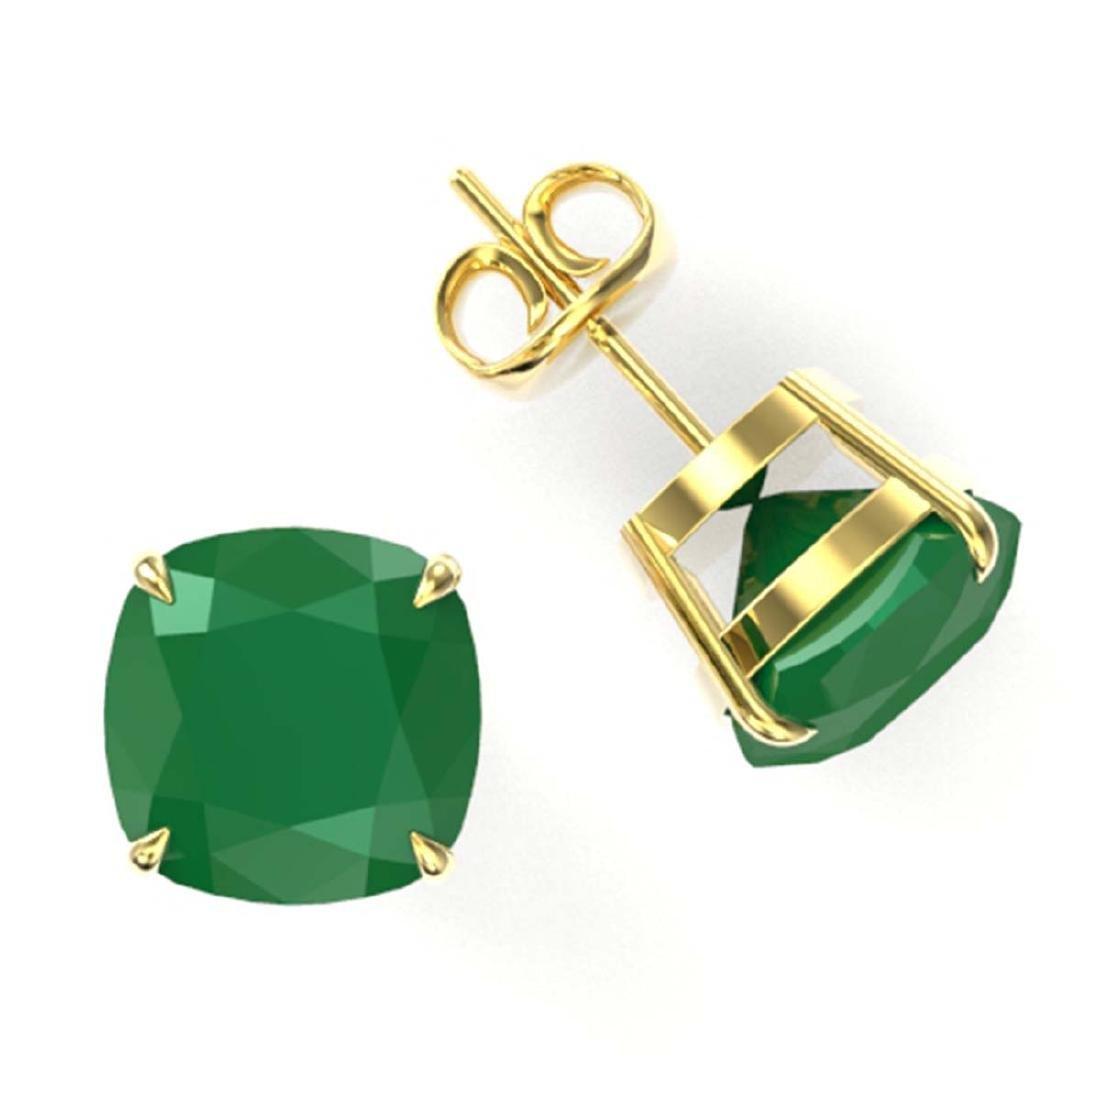 12 ctw Cushion Cut Emerald Stud Earrings 18K Yellow - 2